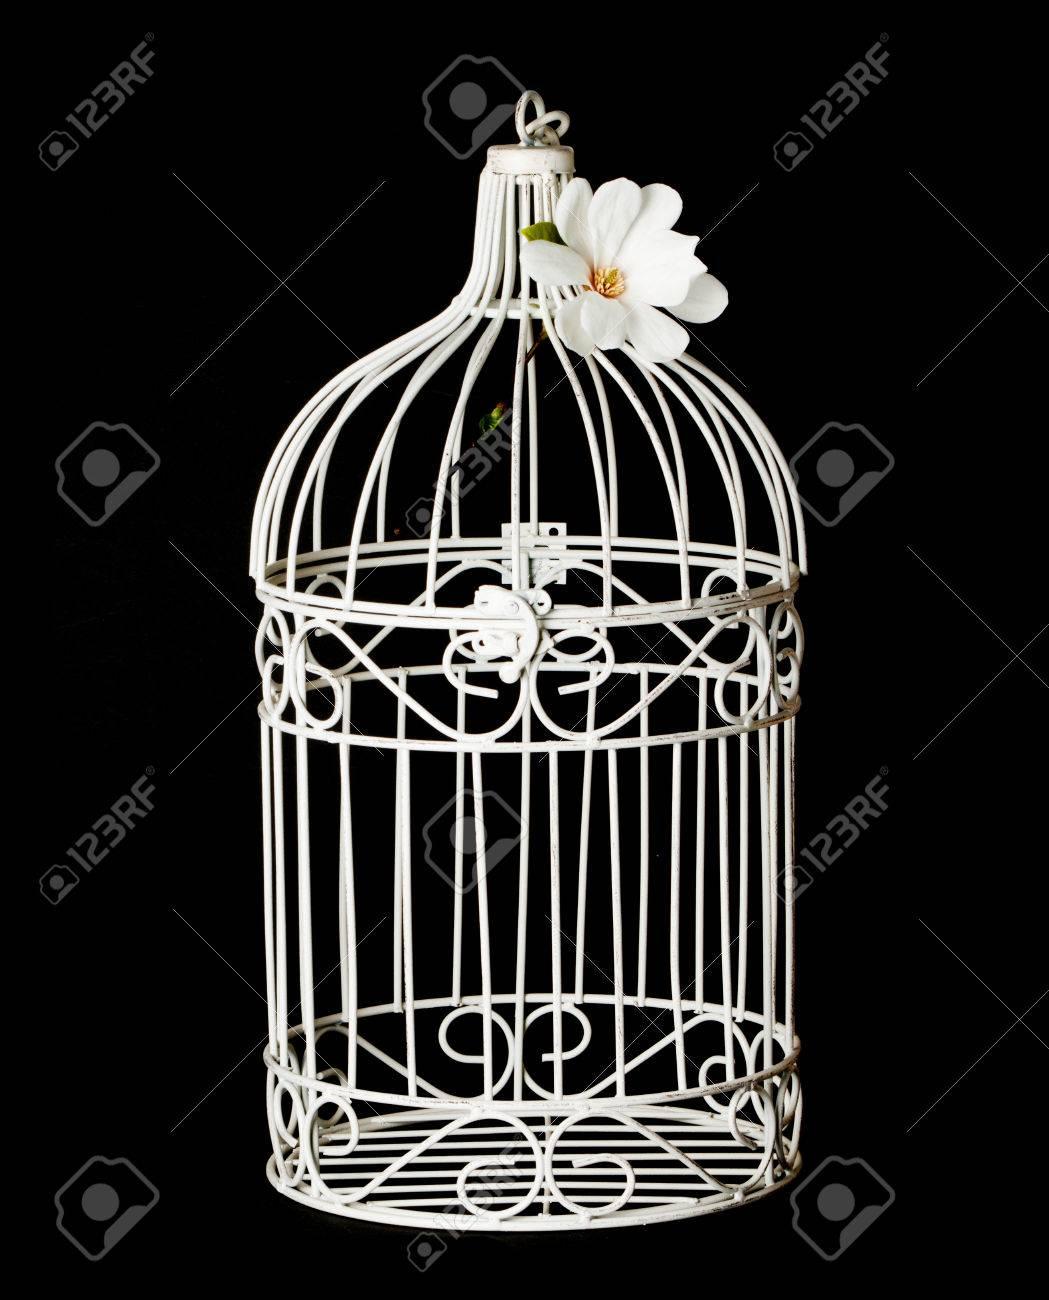 Shabby chic bird cage isolated on black background - 55669240